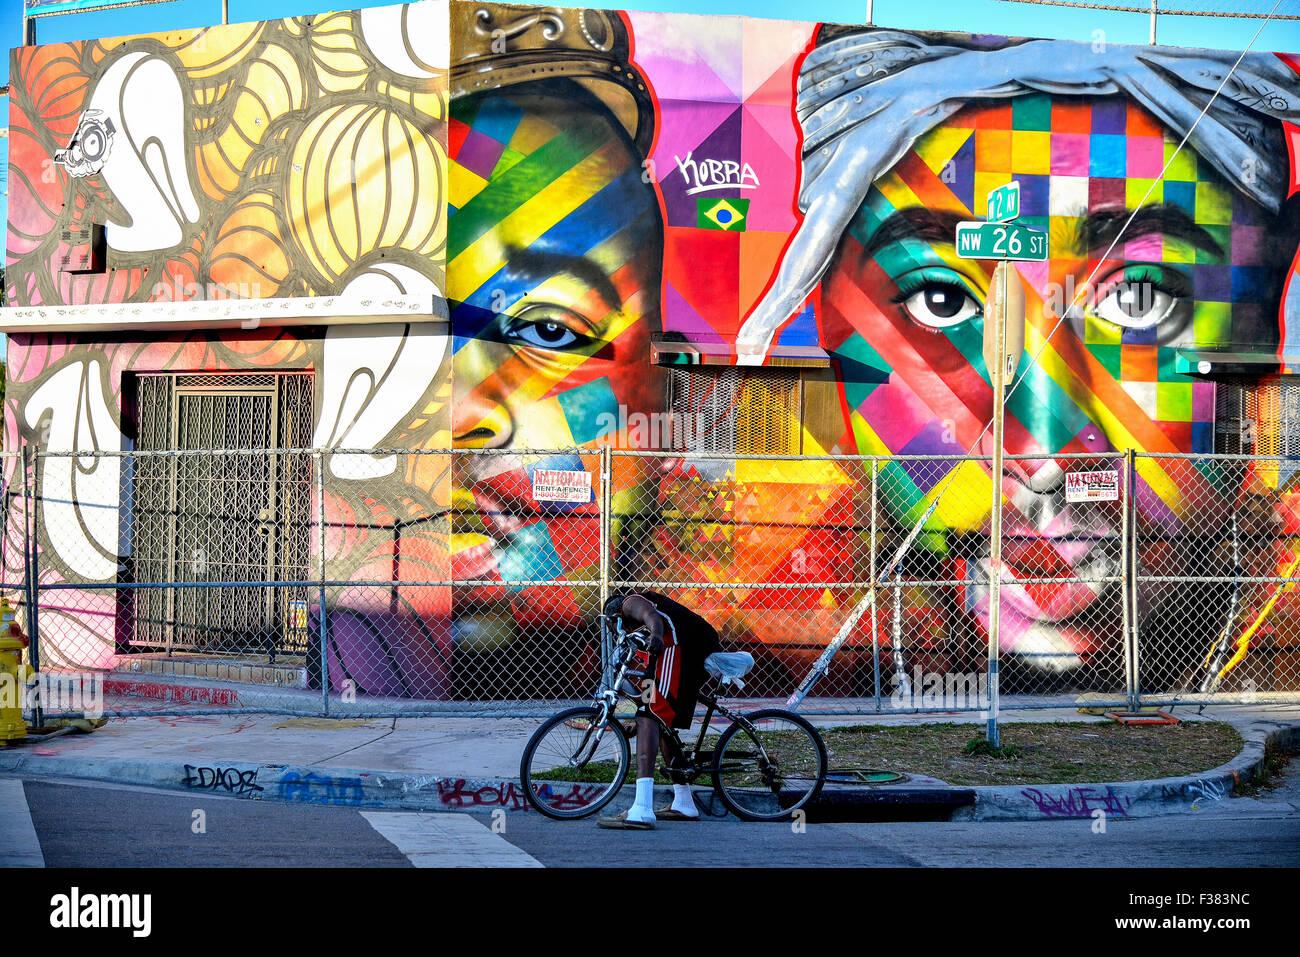 Miami Wynwood Wall Painting Stock Photos Miami Wynwood Wall - Painting miami